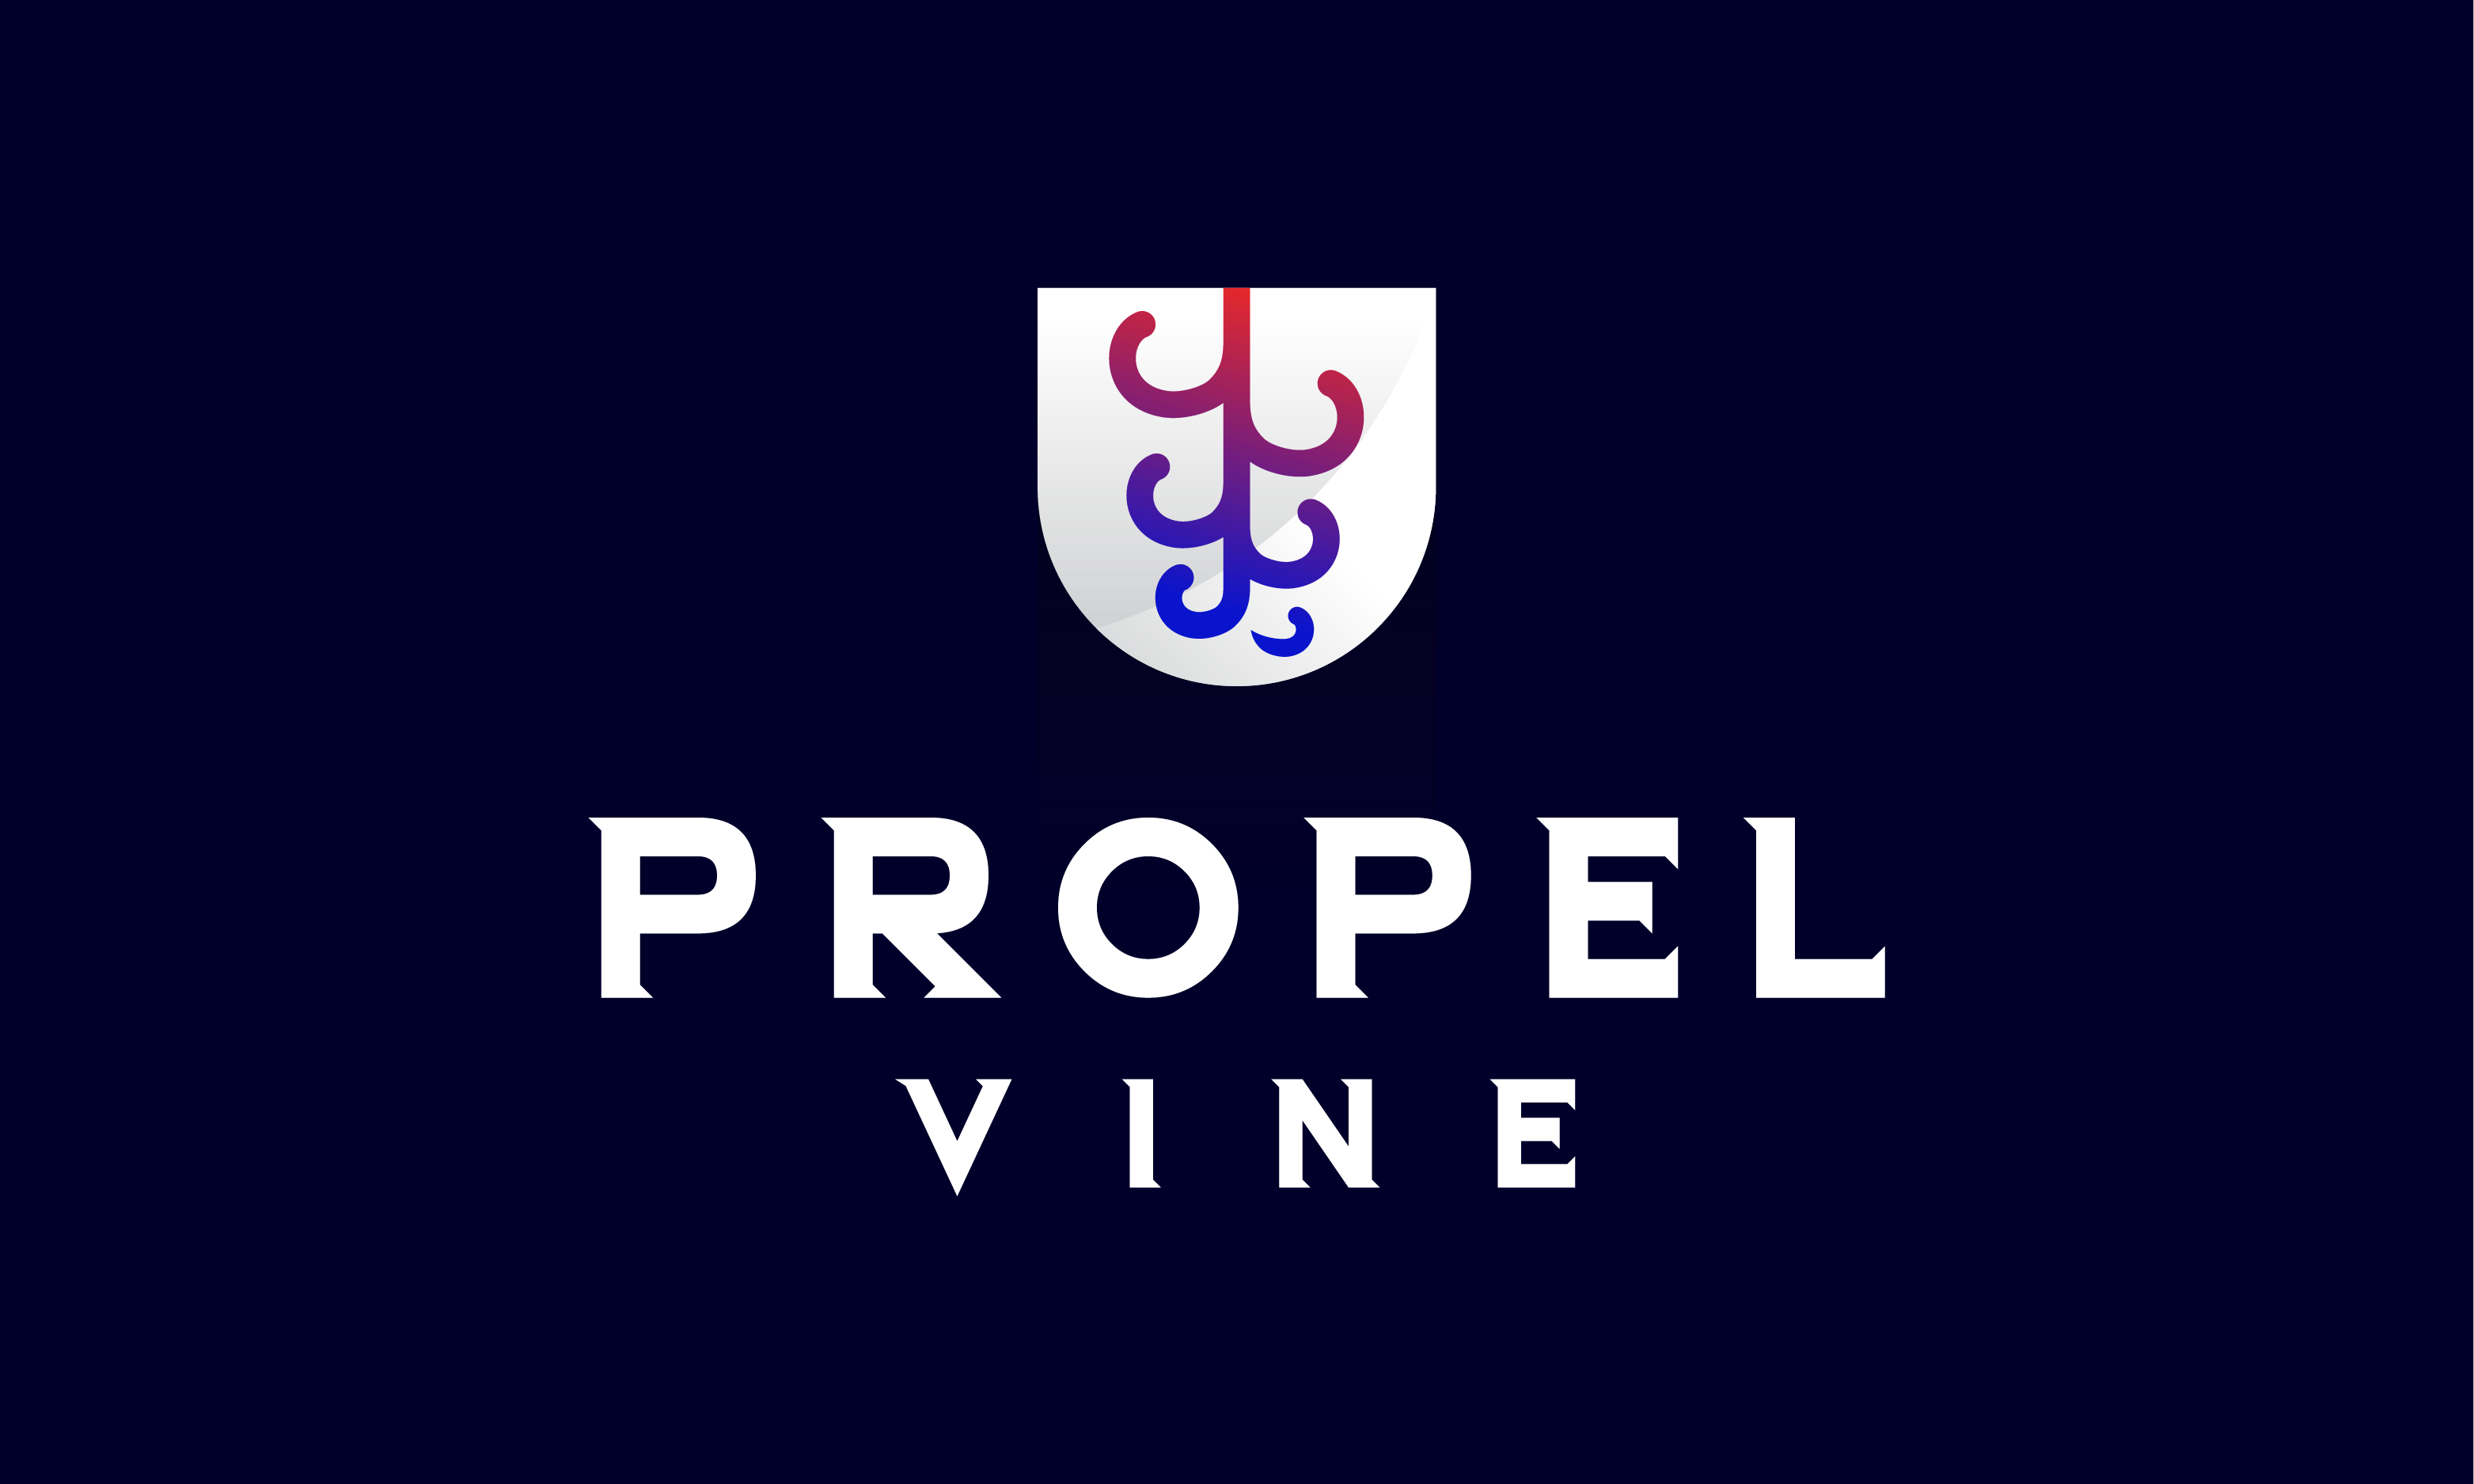 PropelVine.com